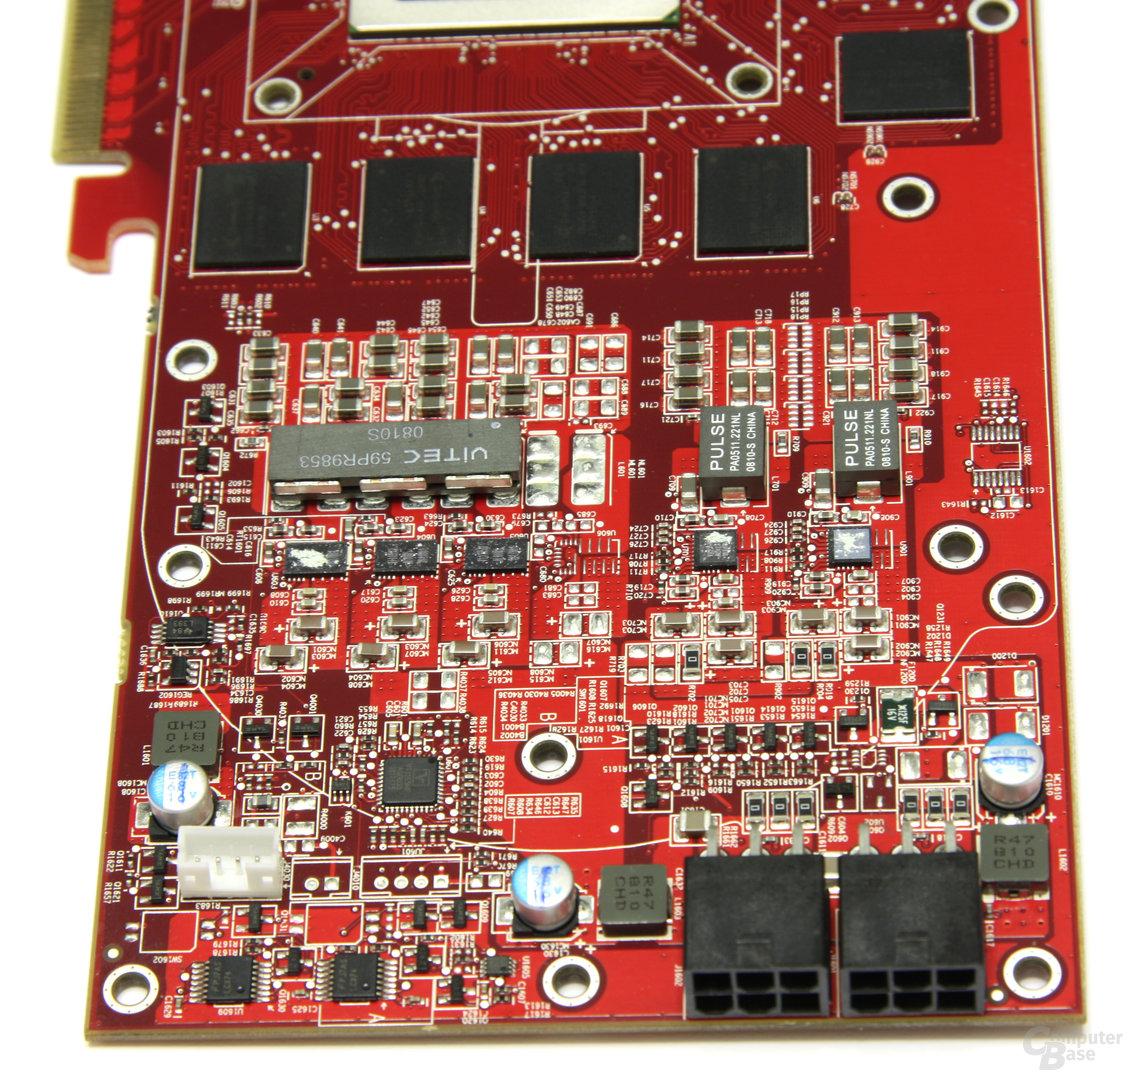 PowerColor Radeon HD 4870 Spannungswandler